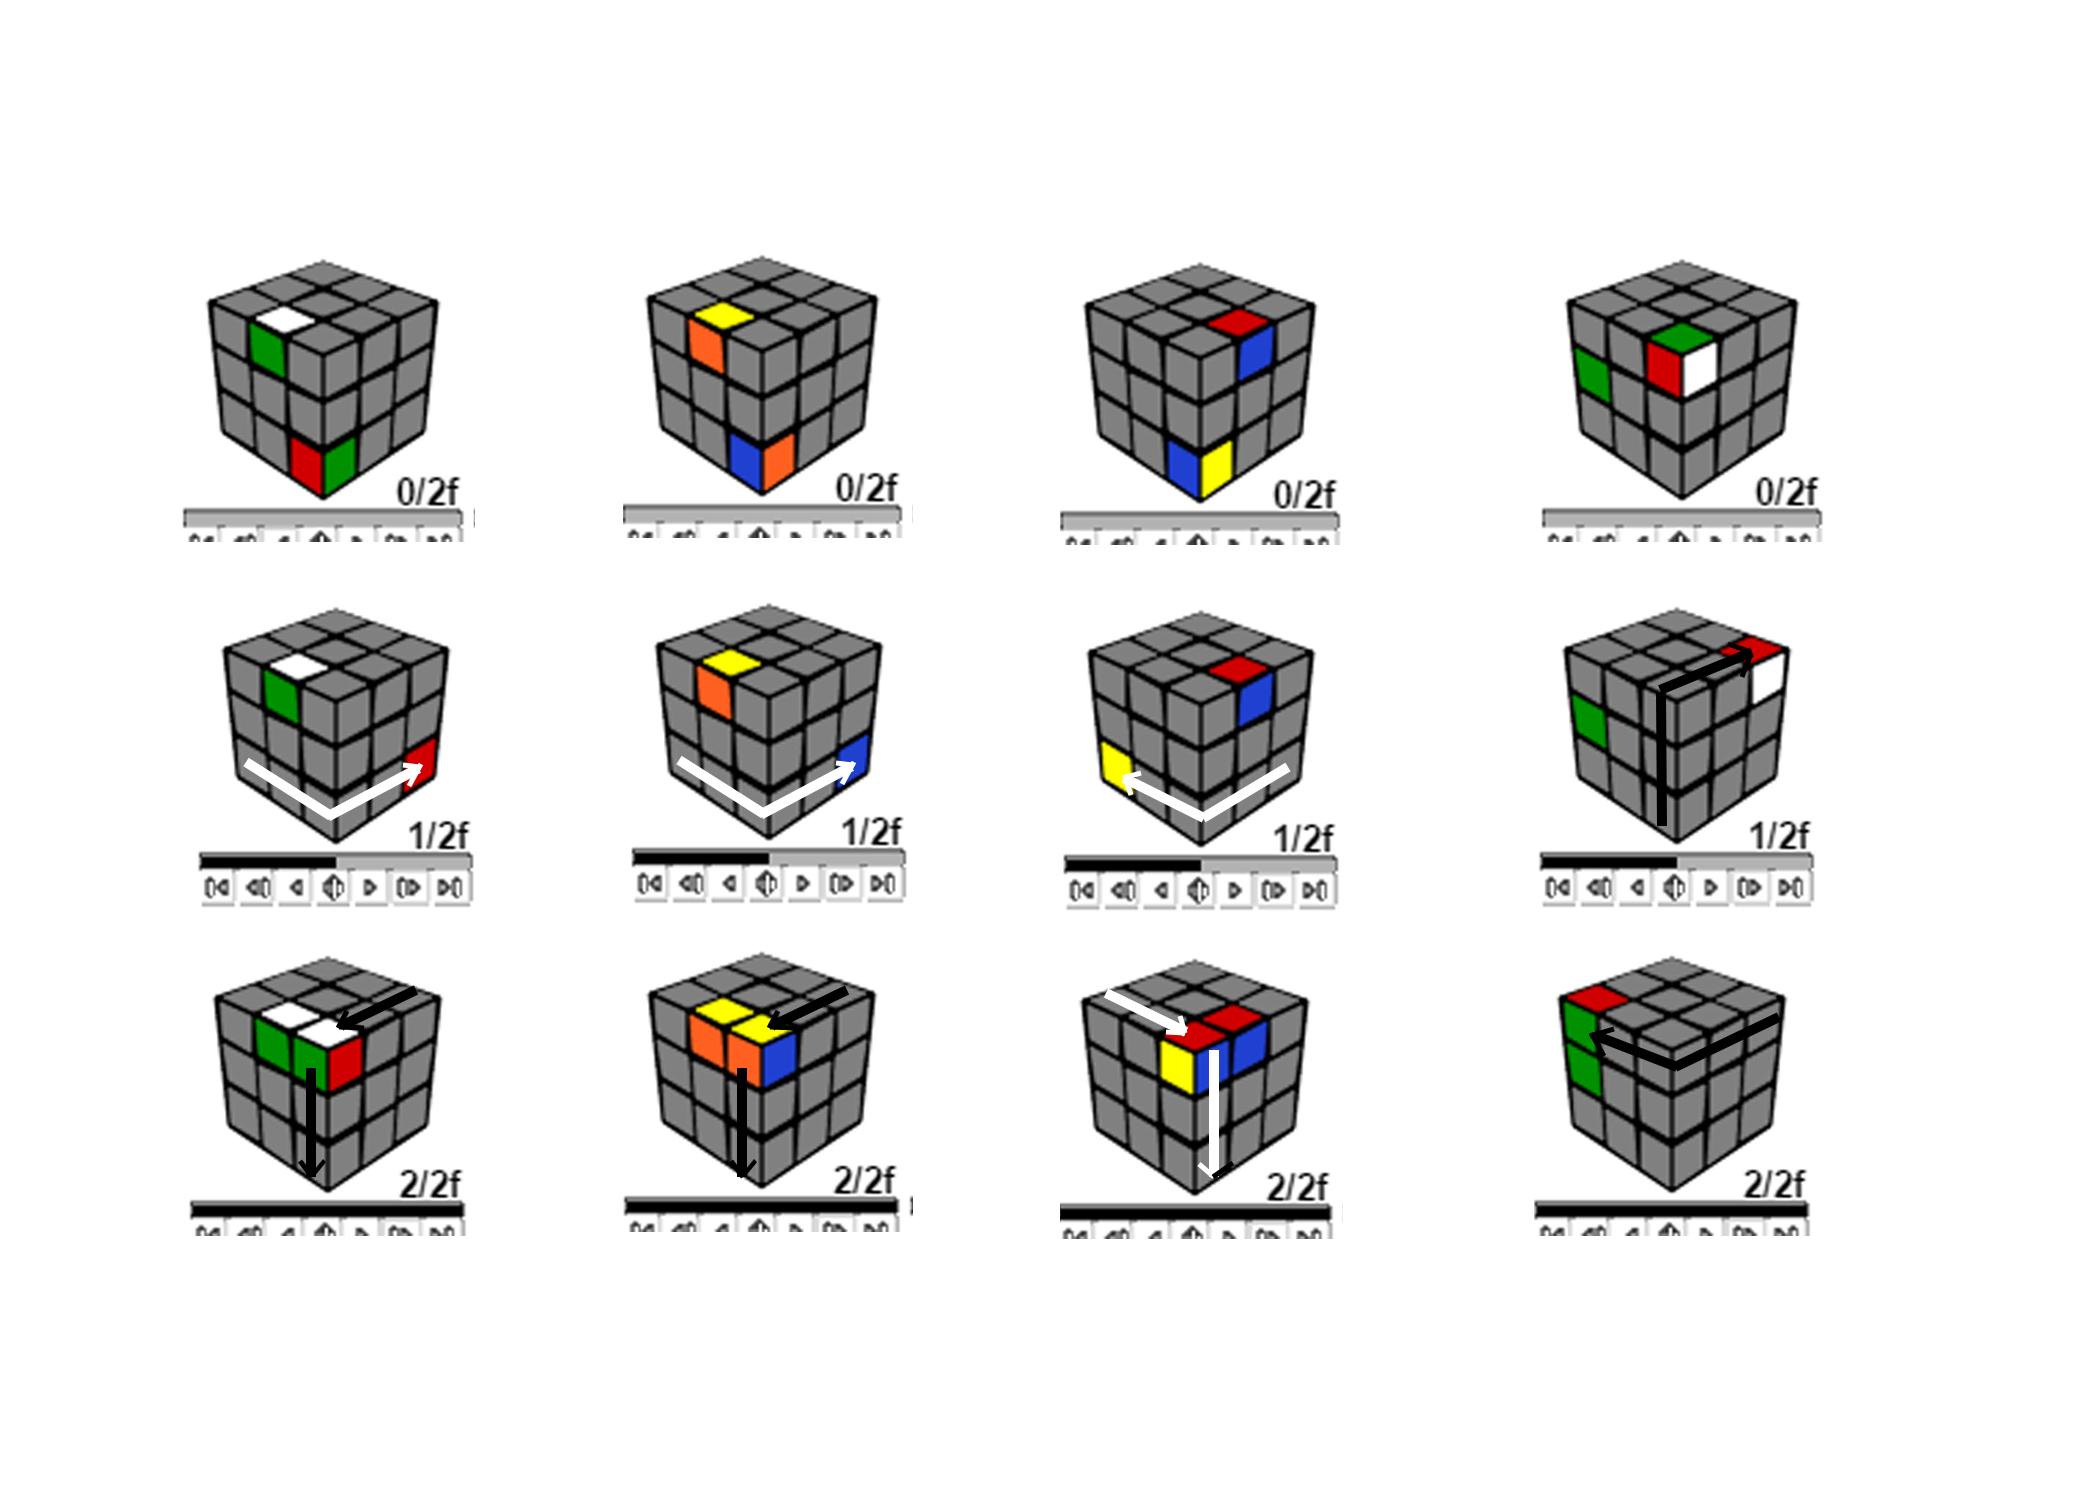 Symmetry In Solving Rubik S Cube